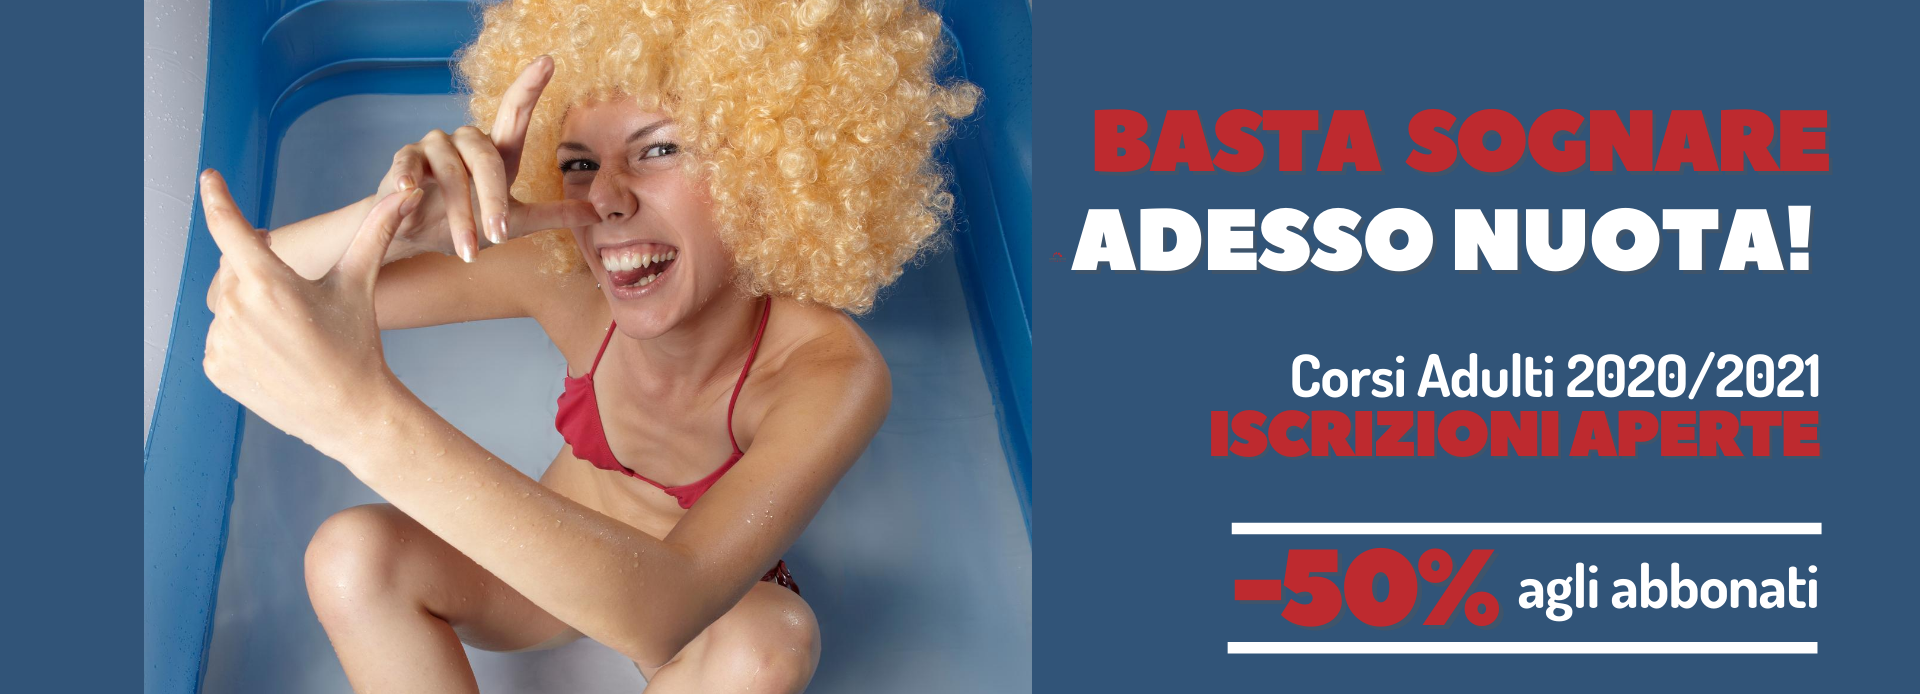 Slide-Scuola-Nuoto-Adulti-2020_2021-5